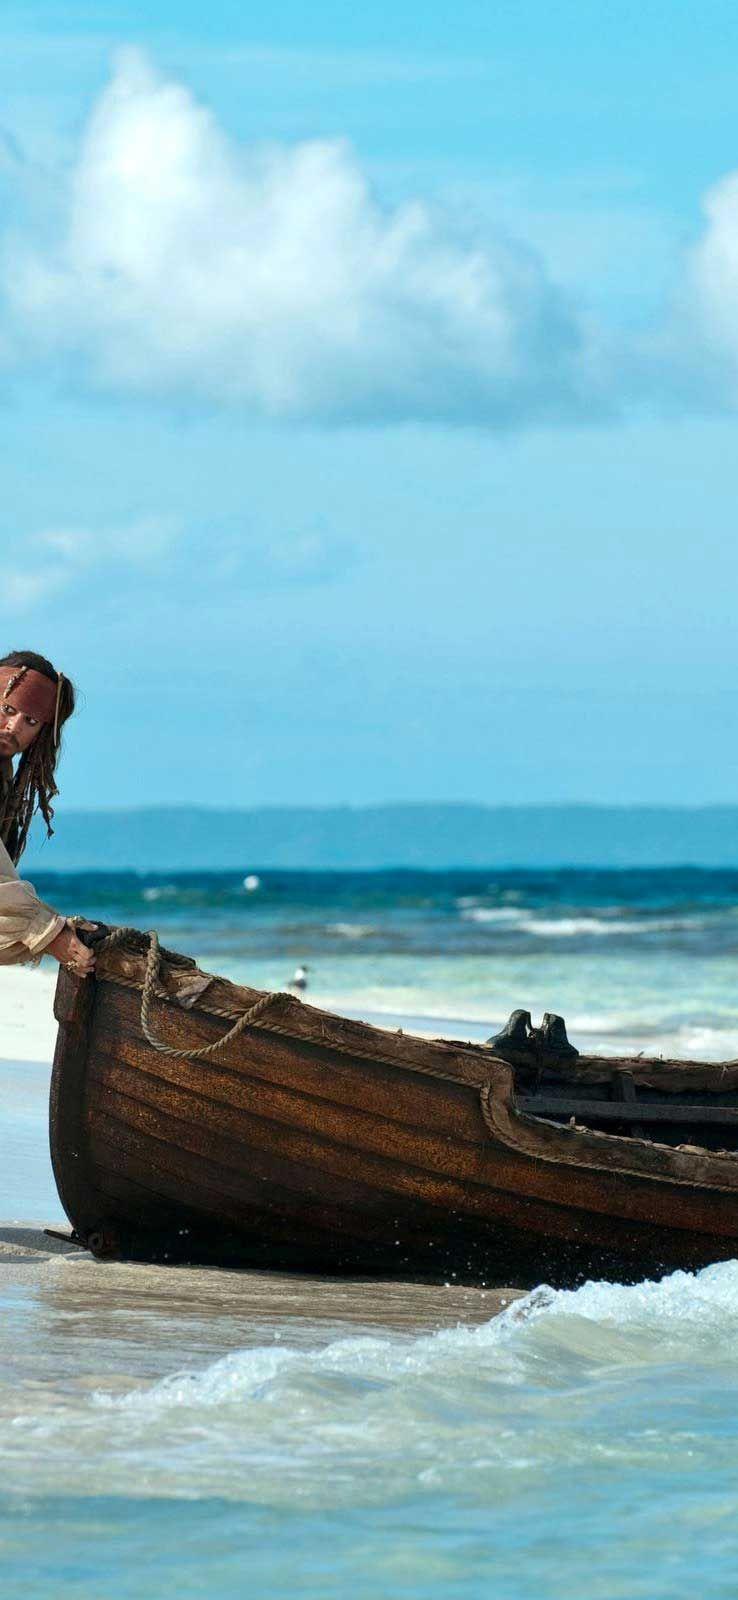 Iphone X Wallpaper Beach Wallpaper Pirates Of The Caribbean Iphone Hd Beach Wallpaper Johnny Depp Wallpaper Pirates Of The Caribbean